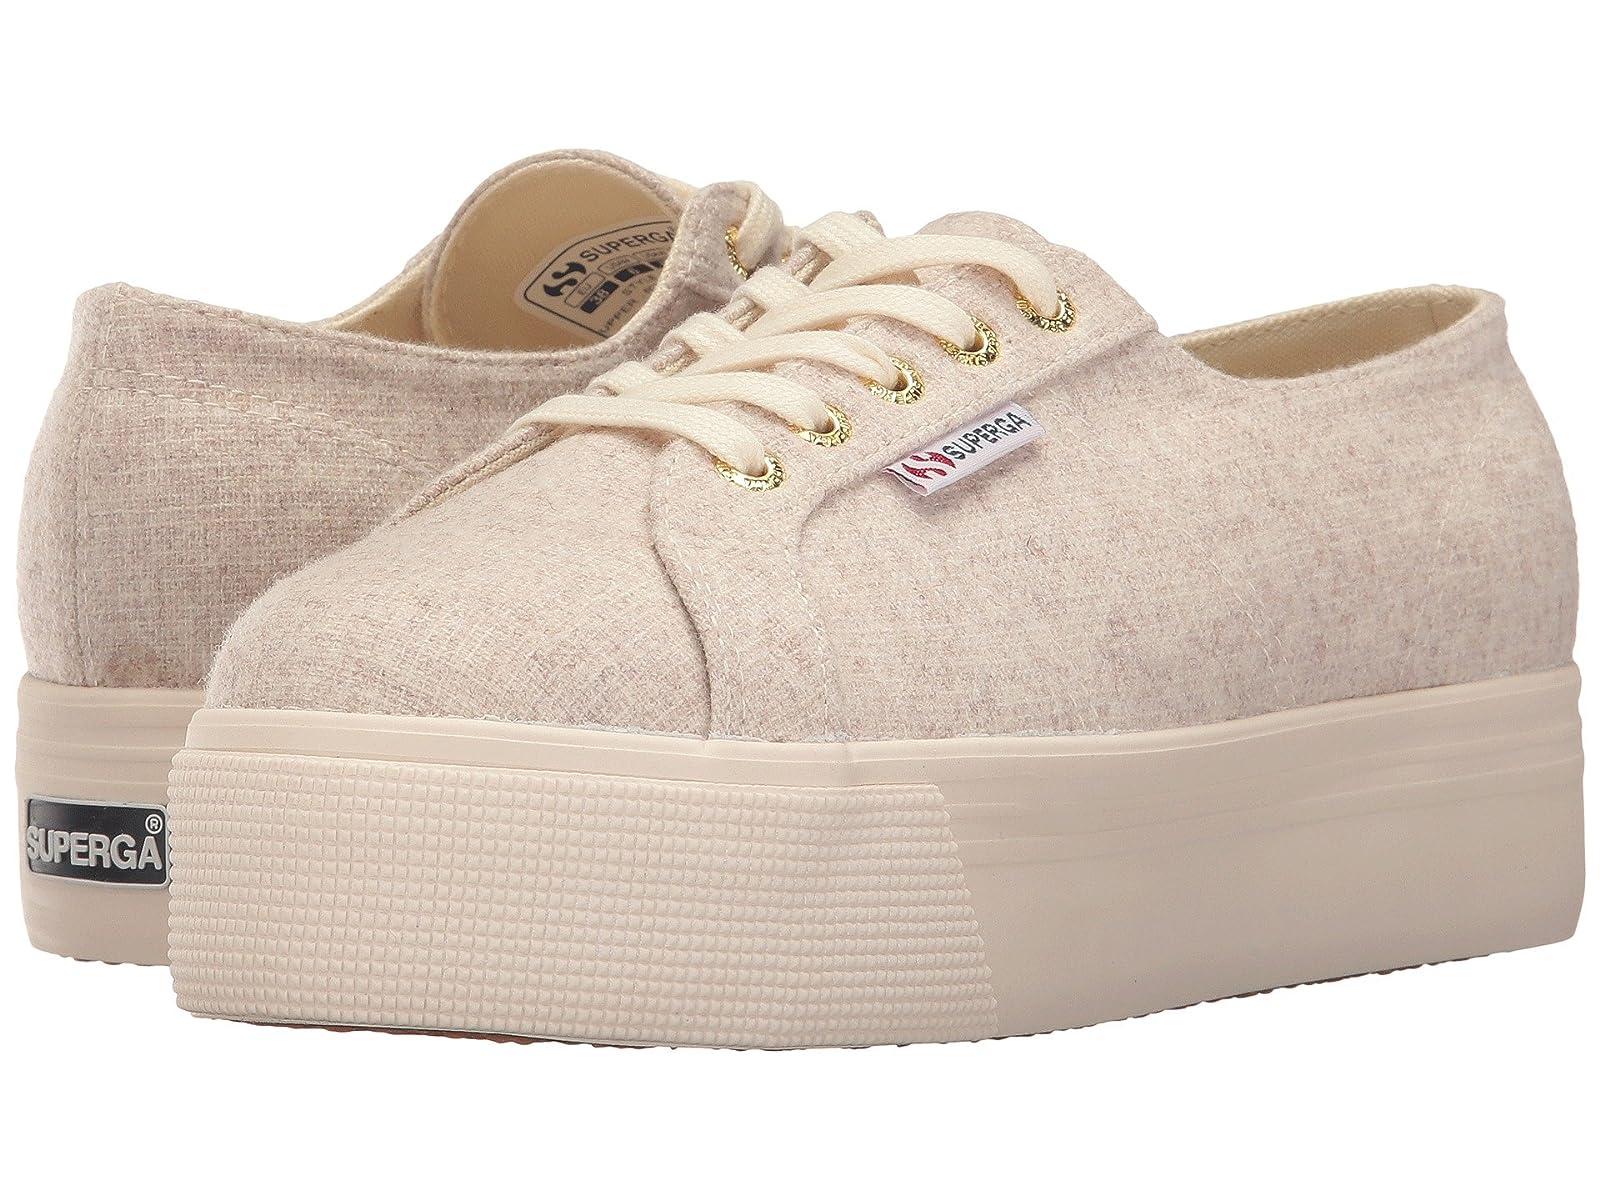 Superga 2790 PolywoolCheap and distinctive eye-catching shoes